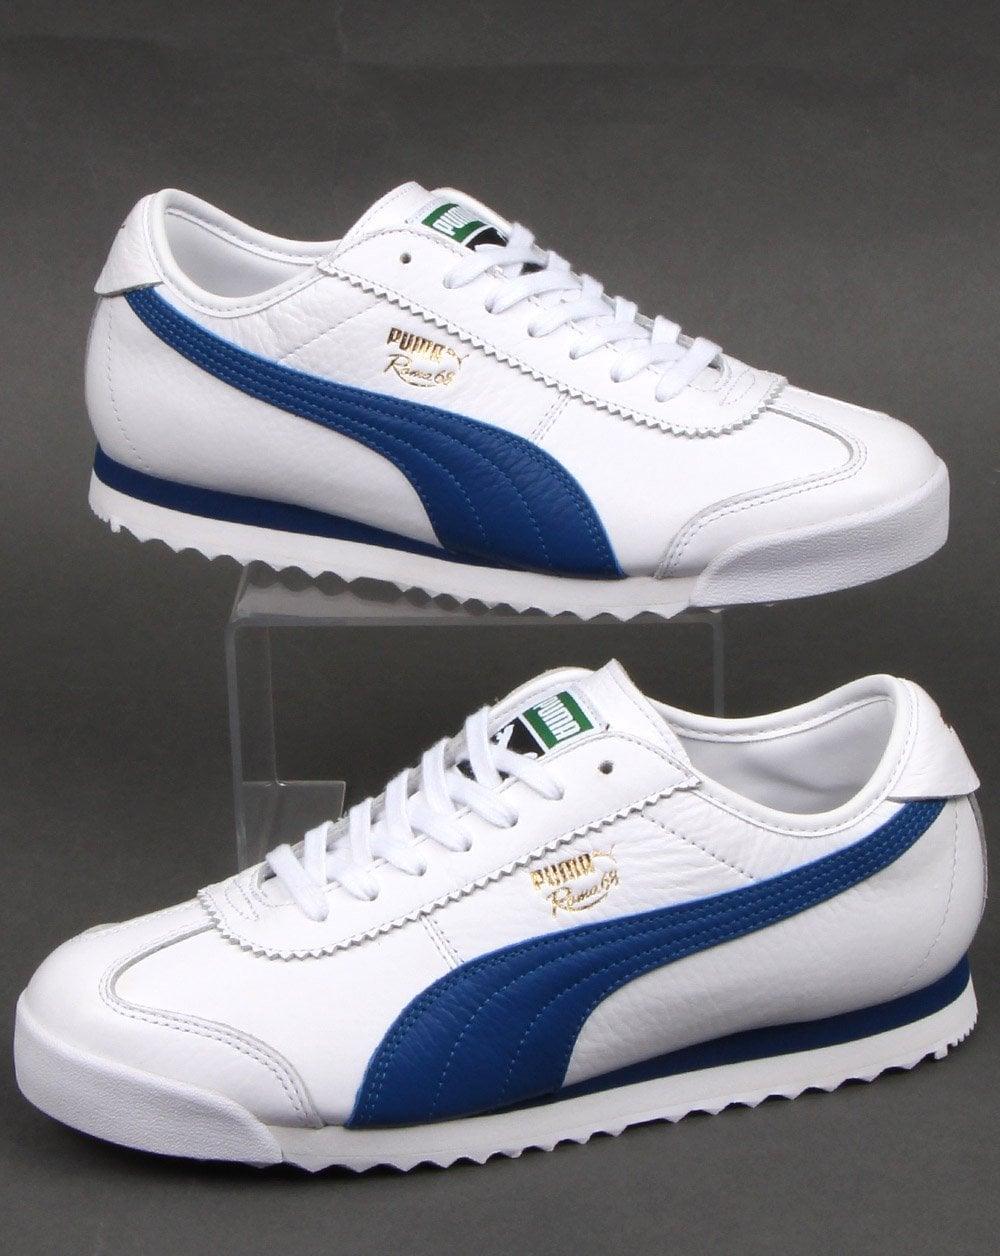 Puma Roma 68 Vintage Trainers Whitegalaxy Blue